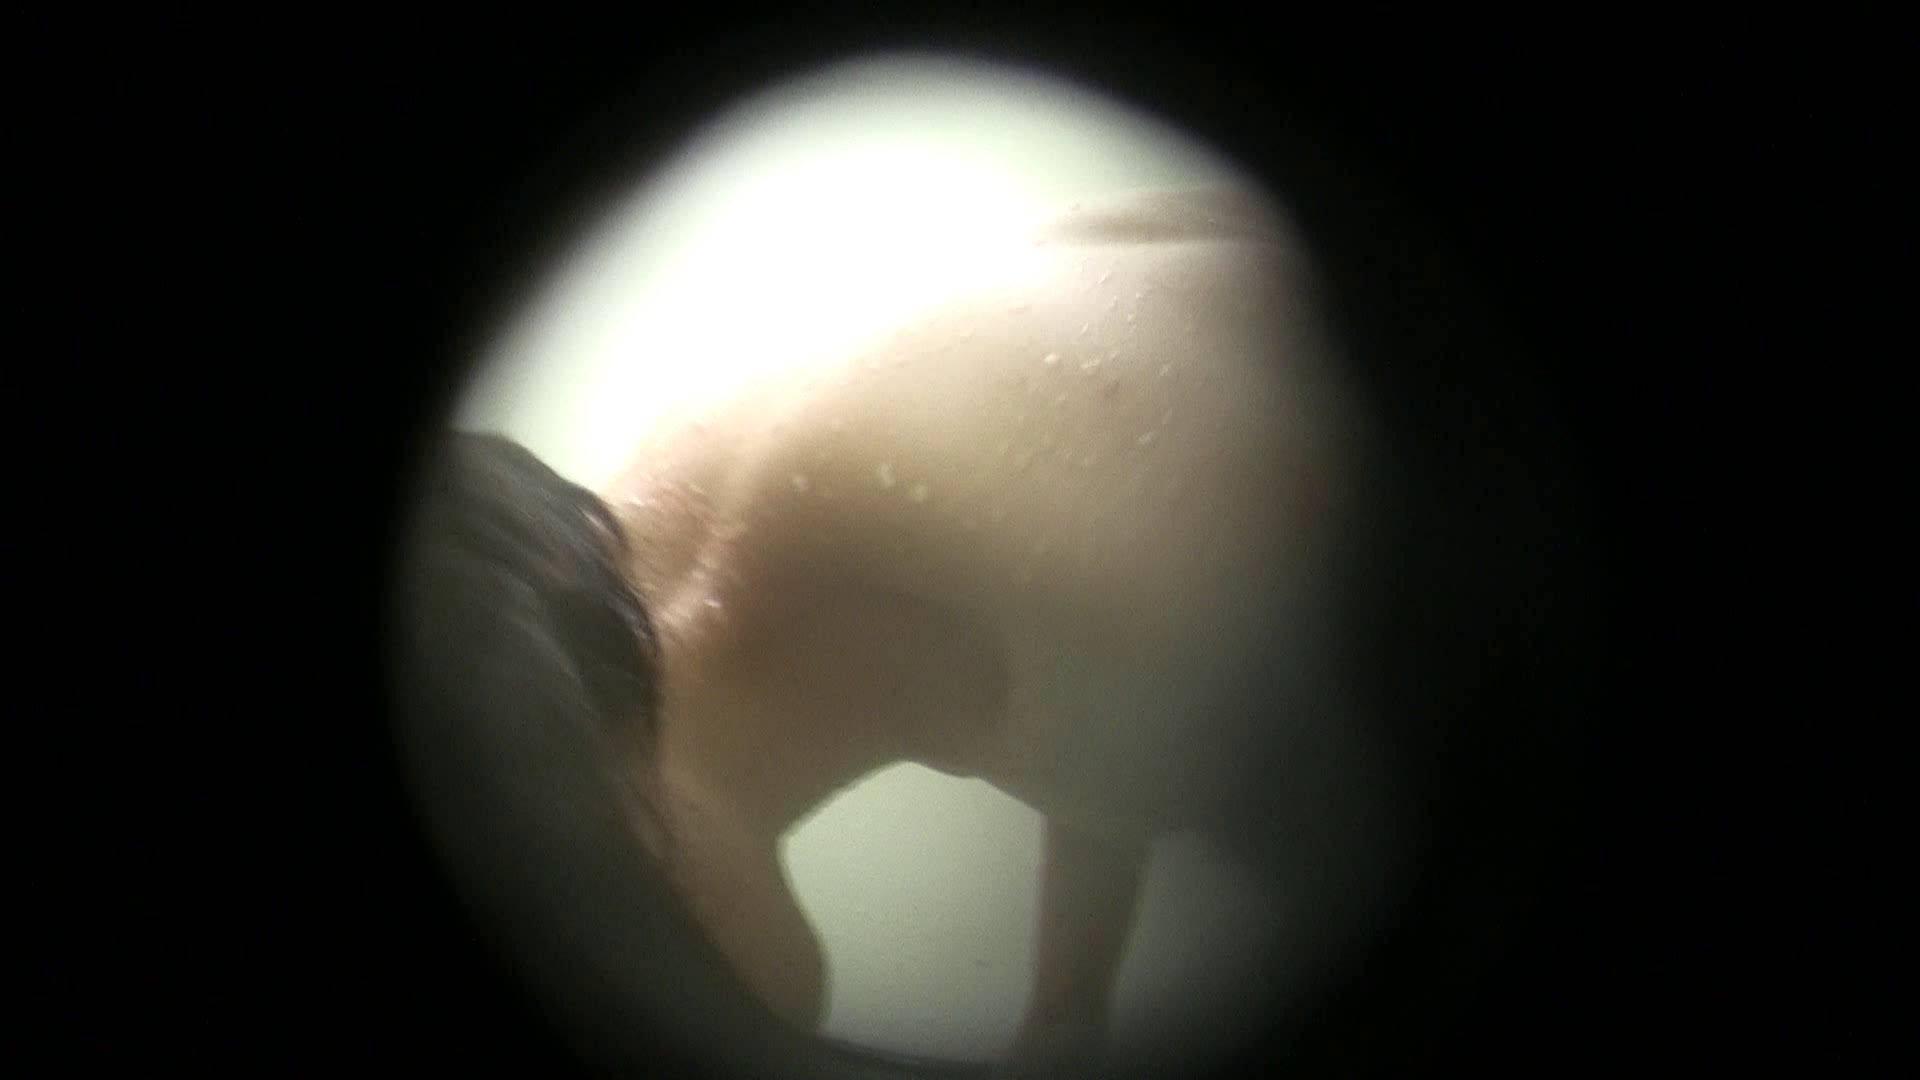 NO.35 勃起力の高い乳首を持つ年増 覗きもの AV動画キャプチャ 109枚 69